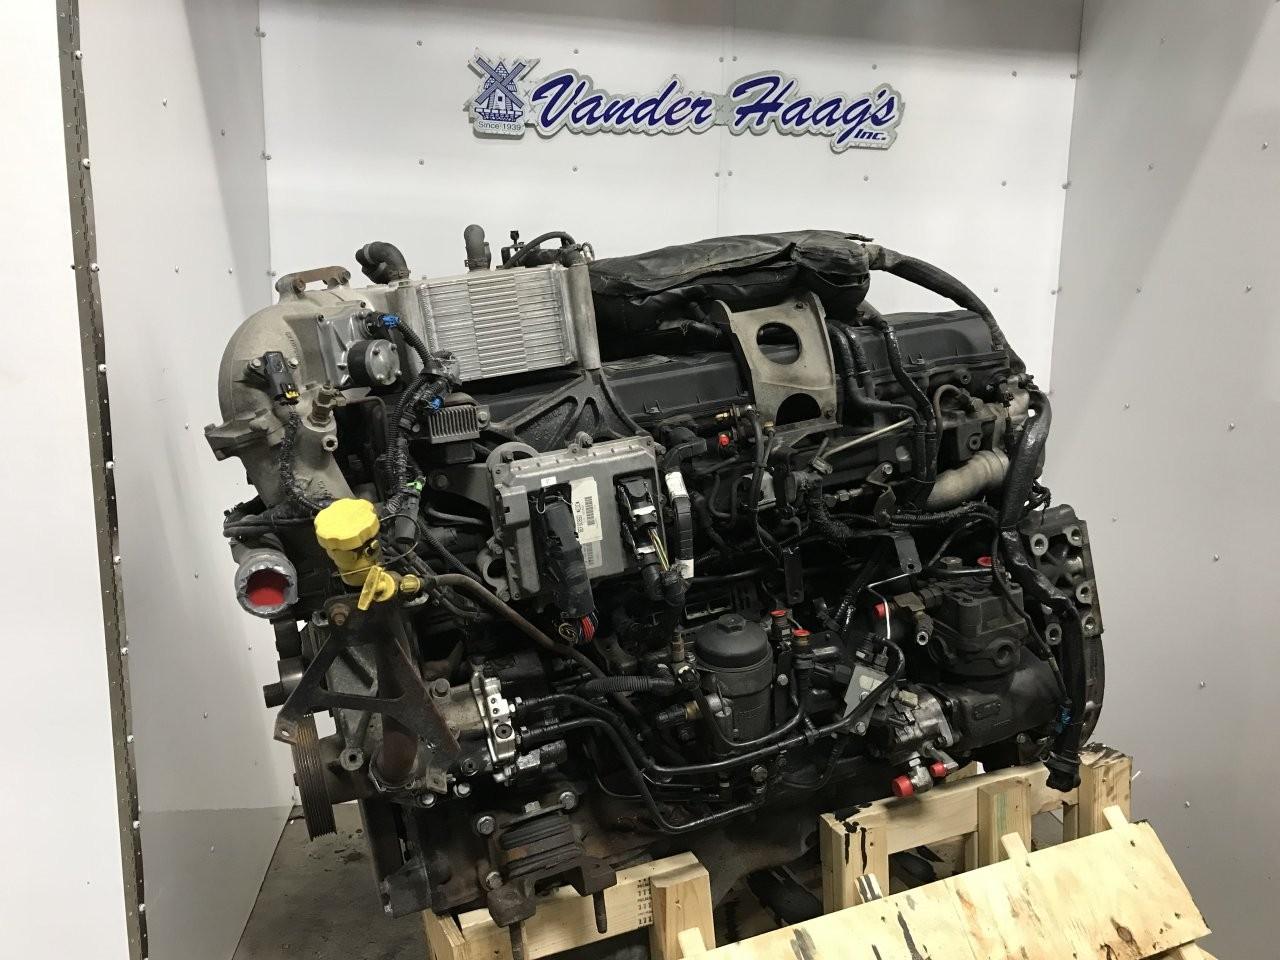 International Engine Breakdown Maxforce 13 International Maxxforce 13 Engine assembly Of International Engine Breakdown Maxforce 13